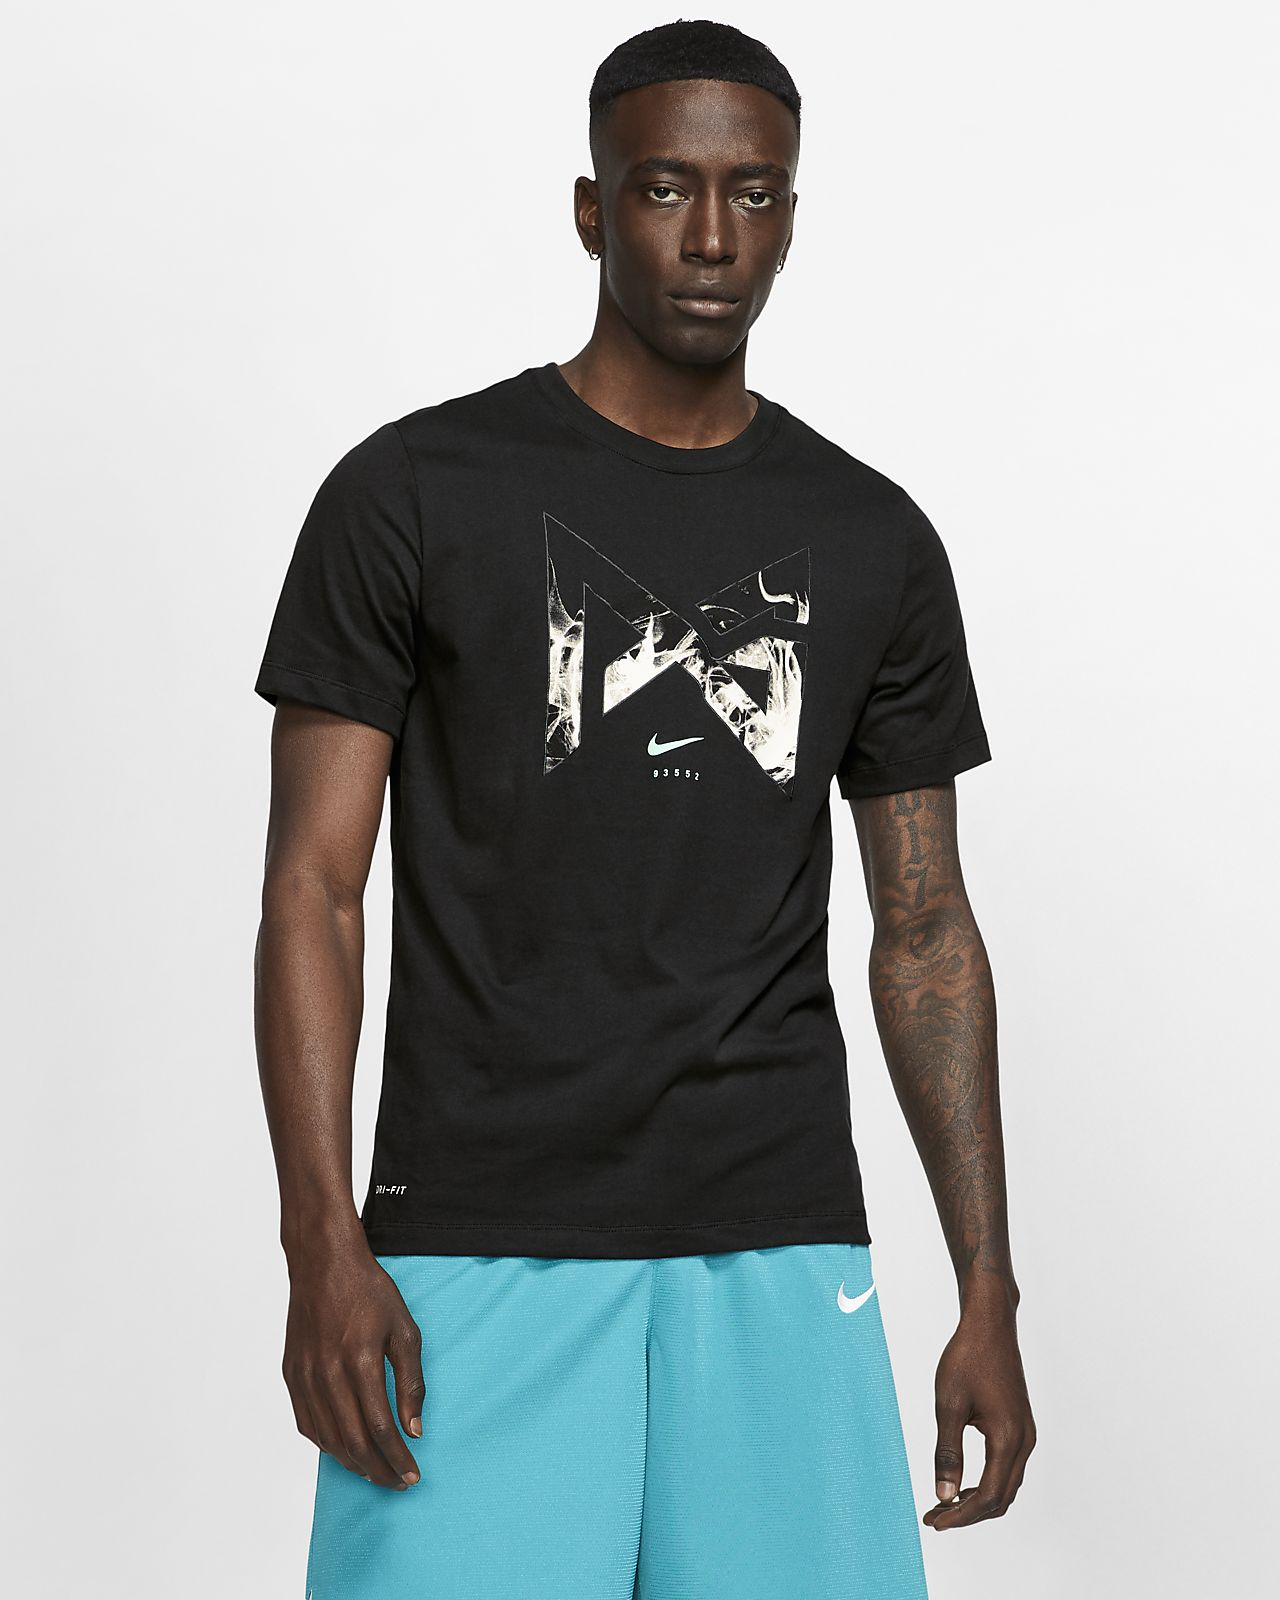 PG Nike Dri-FIT Men's Basketball T-Shirt